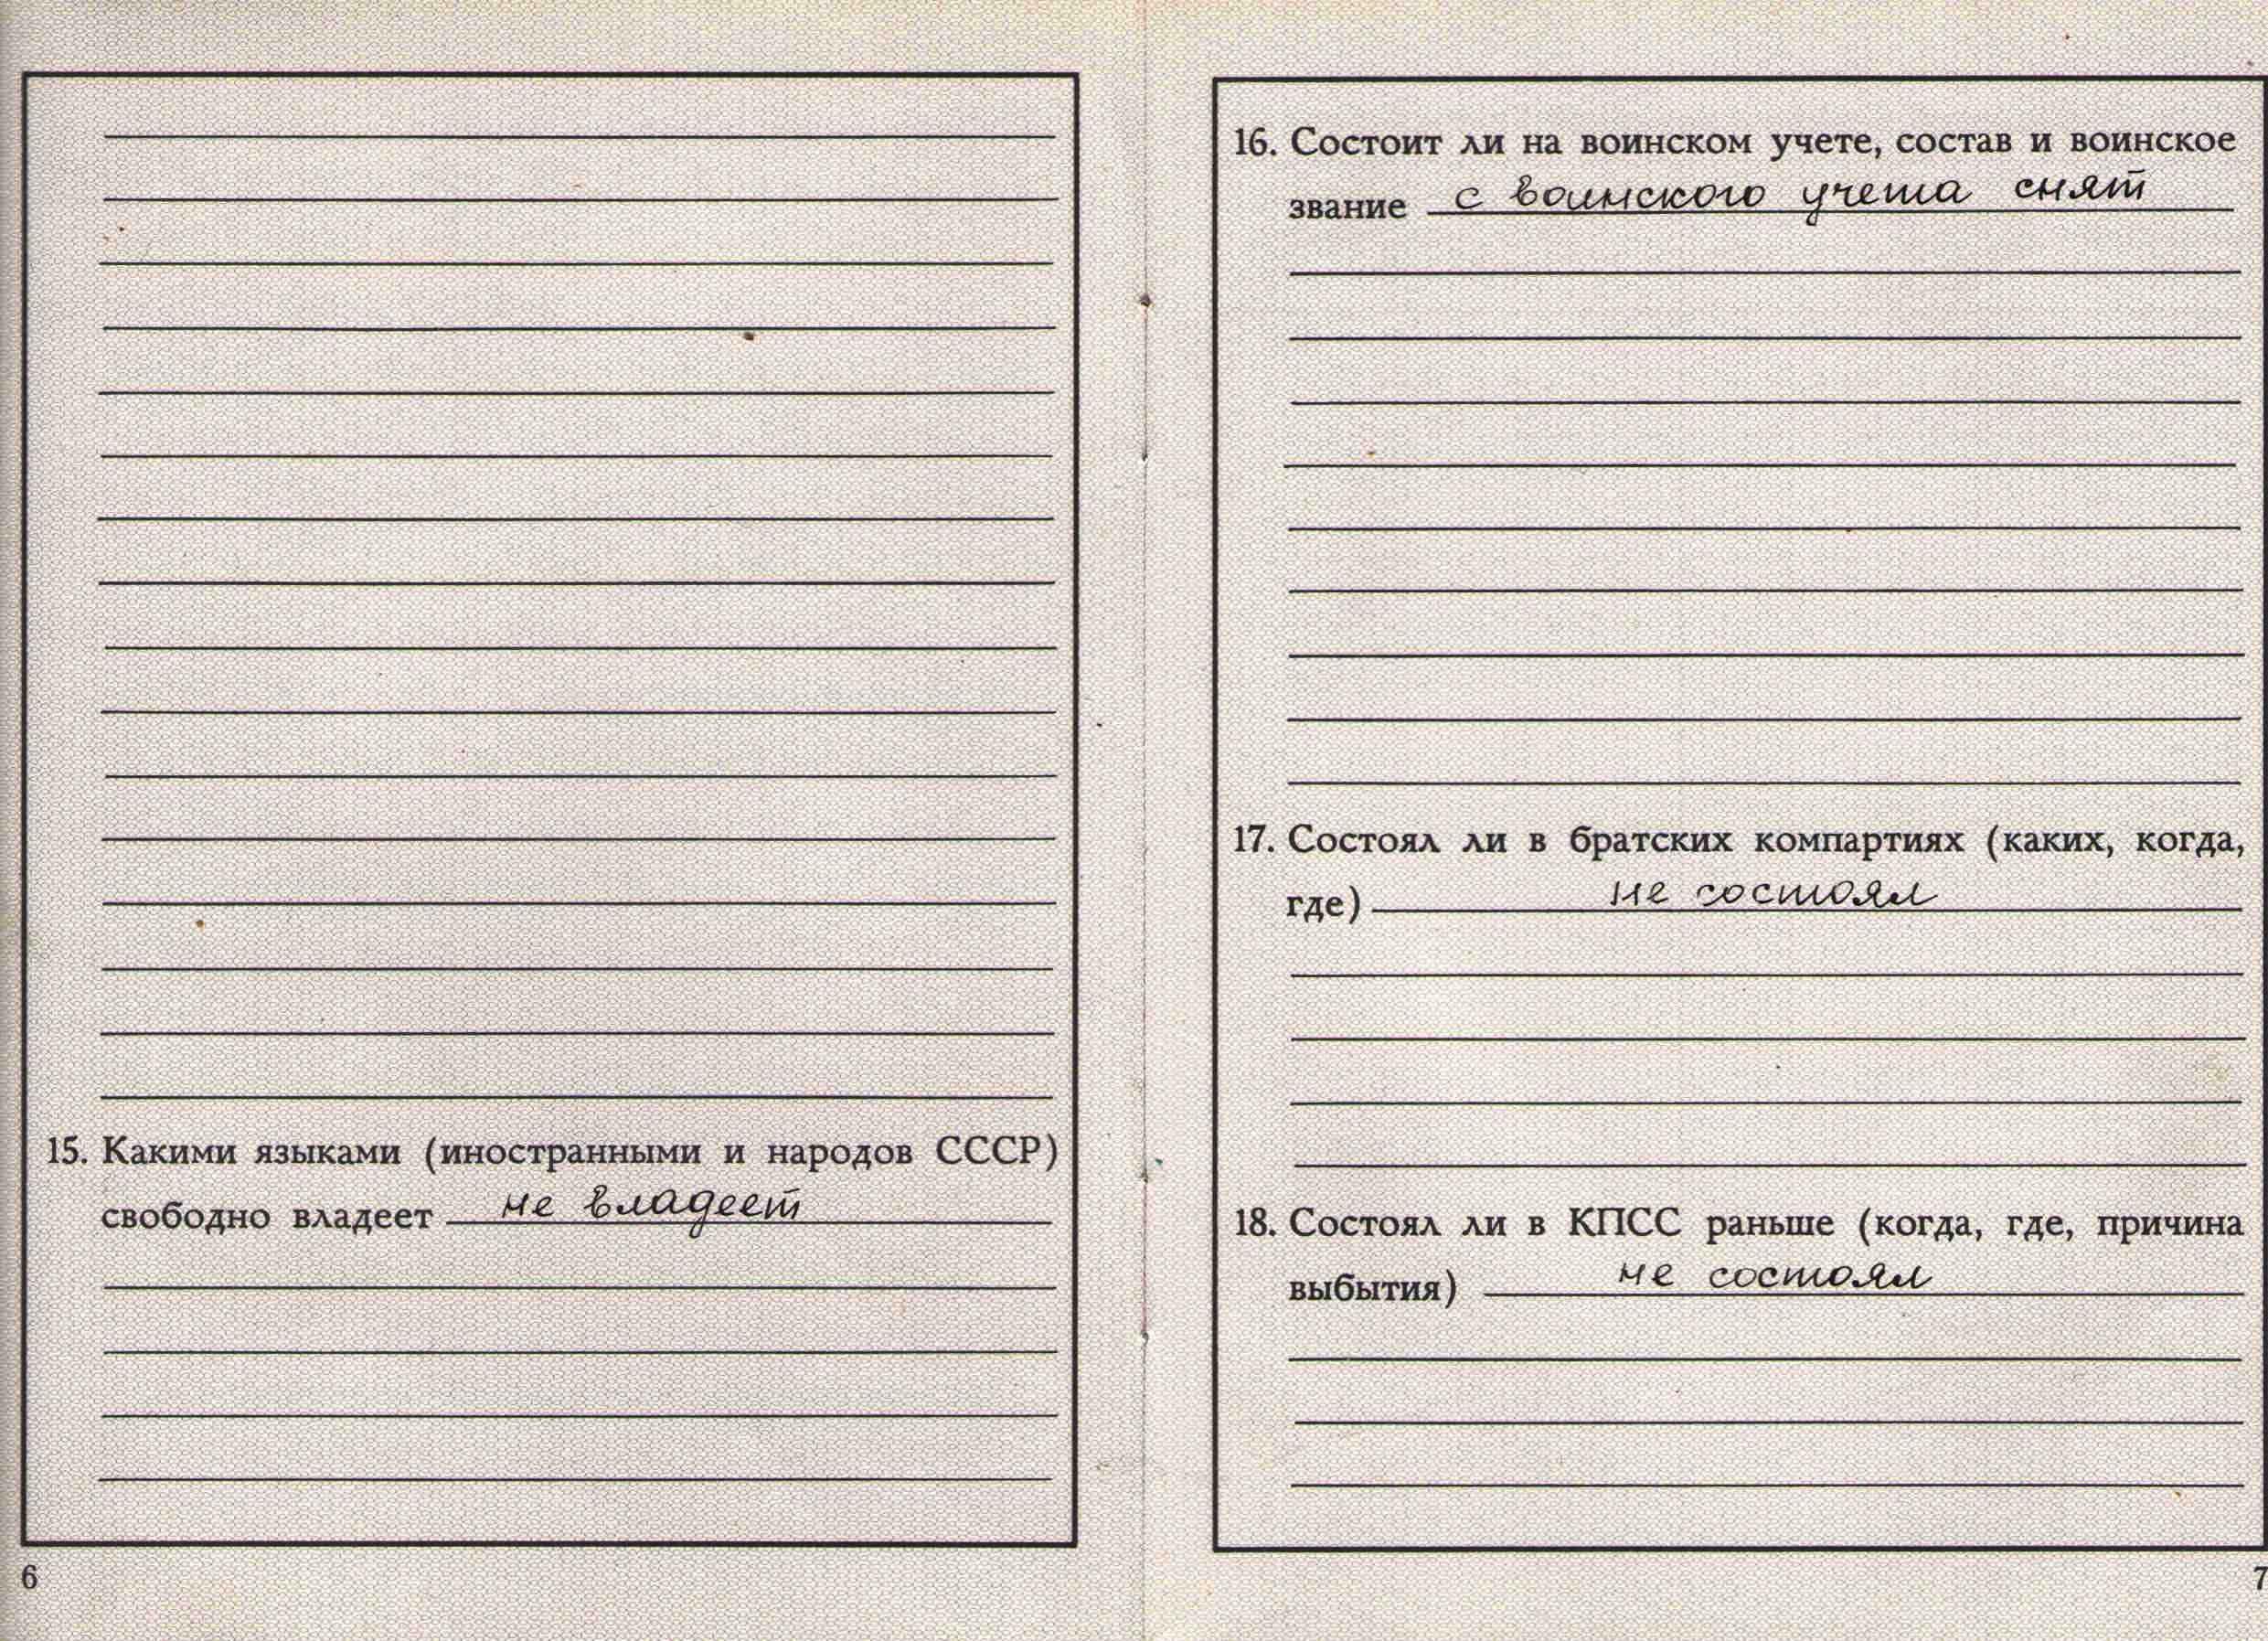 82. Учетная карточка члена партии Барыкина ПП, 1974.